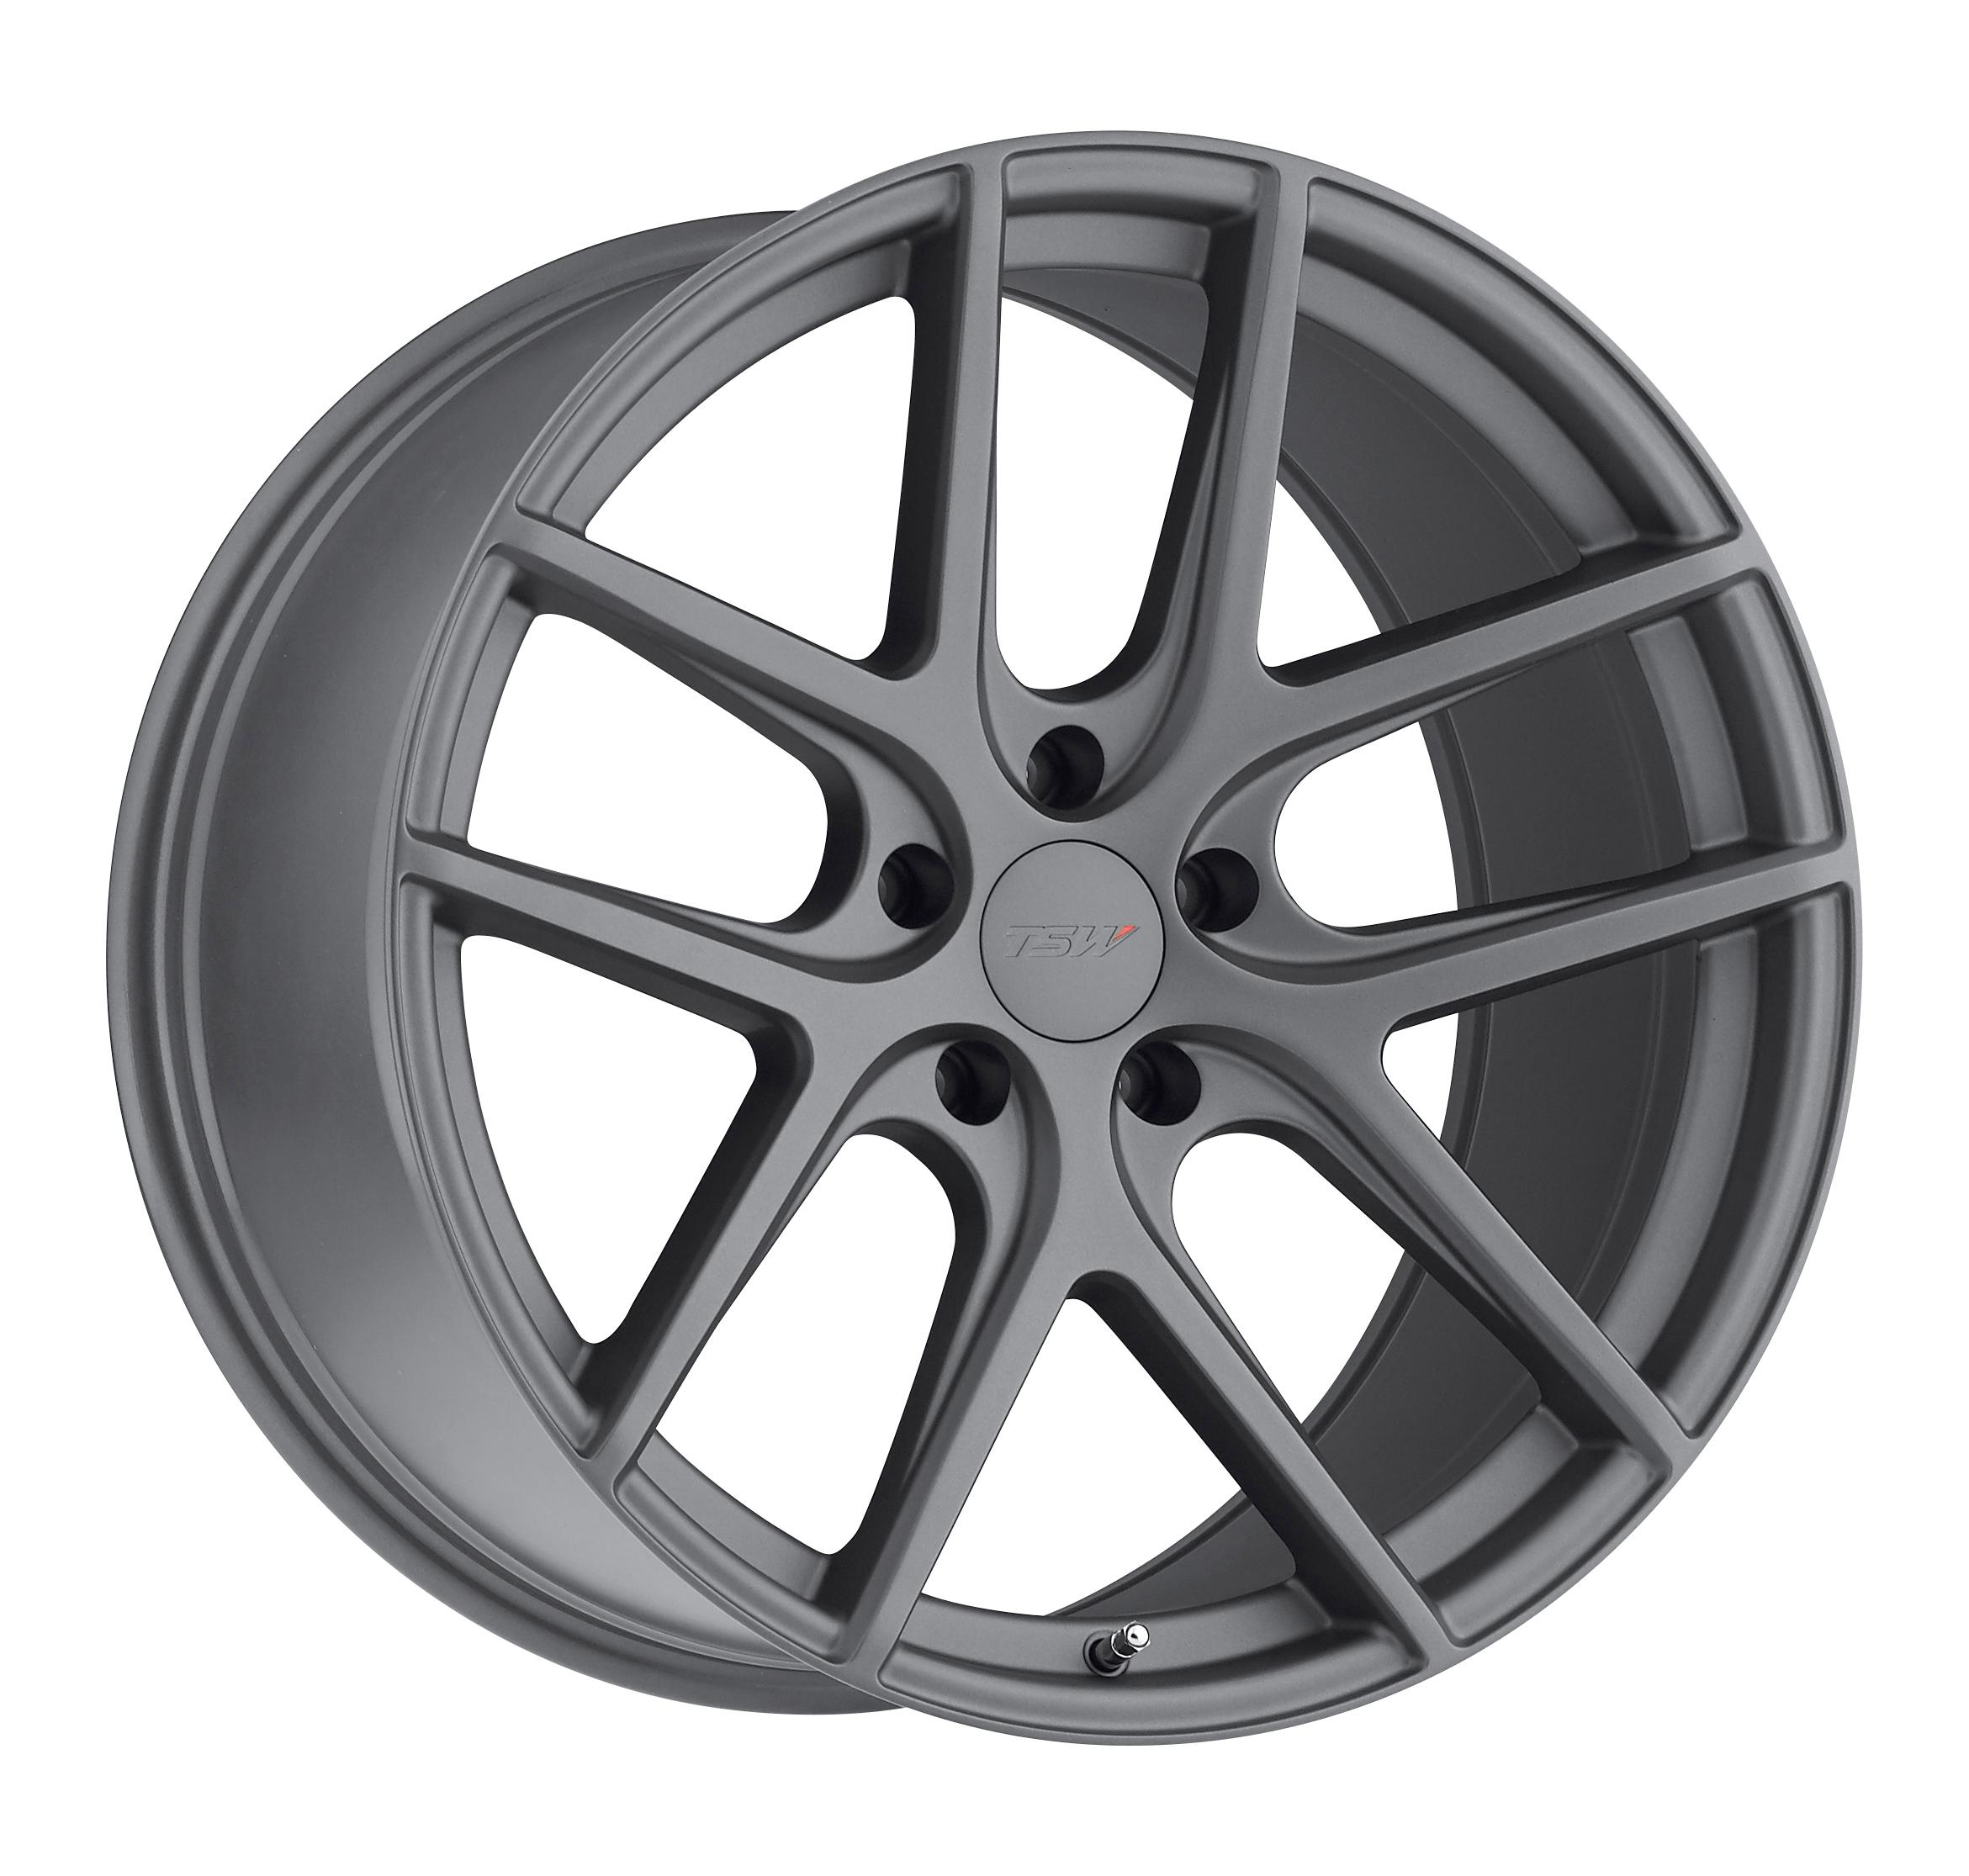 Tsw Geneva Matte Gunmetal Wheels And Rims Packages At Rideonrims Com